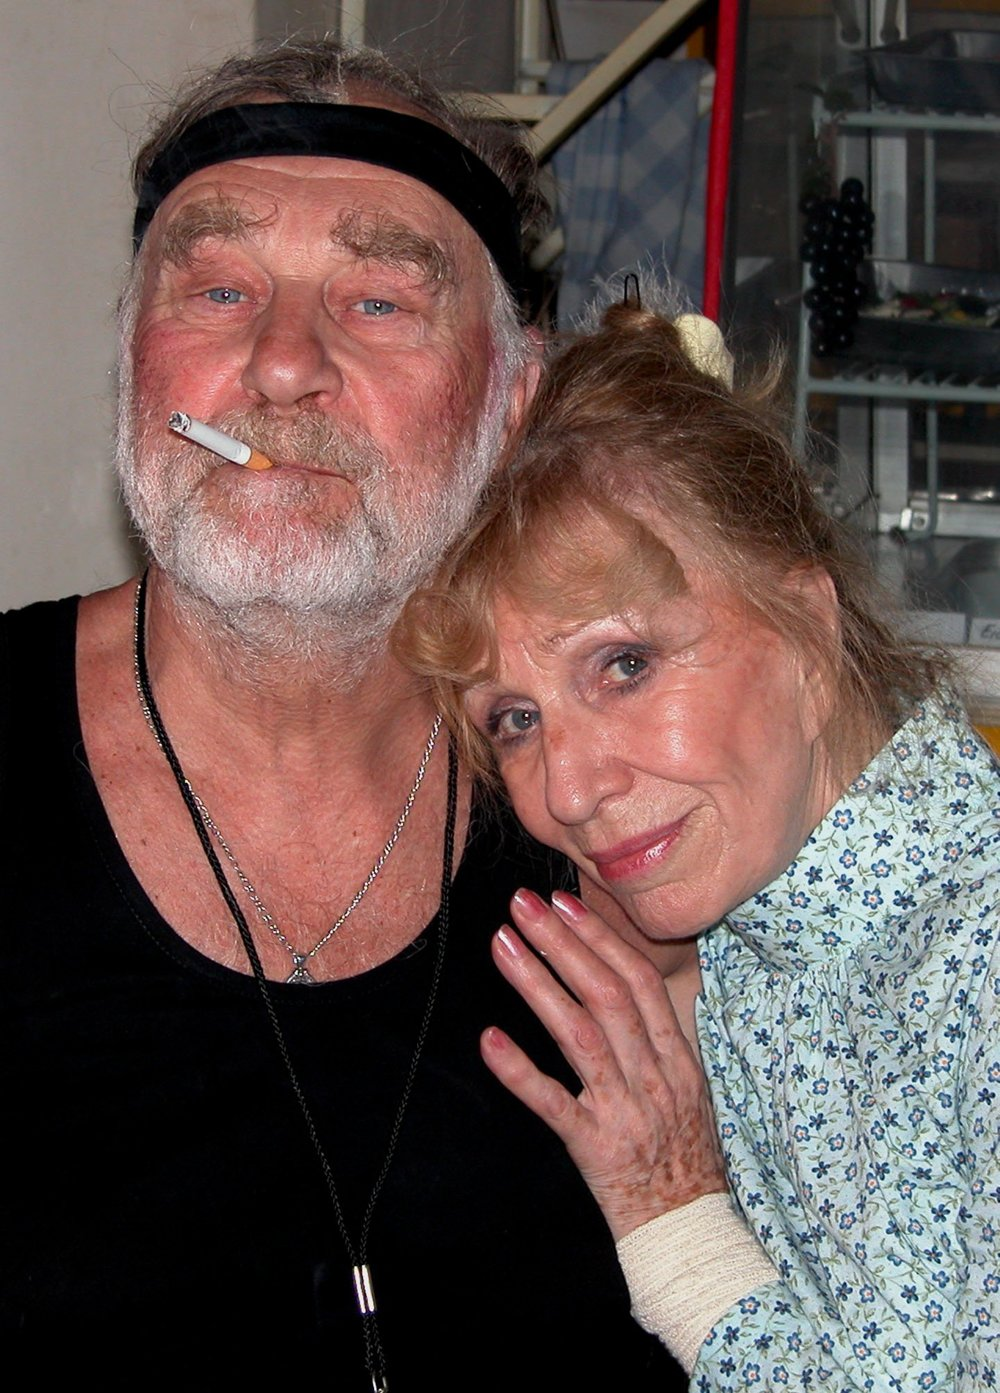 Bláznivých manželov v Nemocnici na pokraji si v hre divadla Nová scéna zahrali herci Leopold Haverl (vľavo) a Mária Kráľovičová (vpravo). Rok 2004